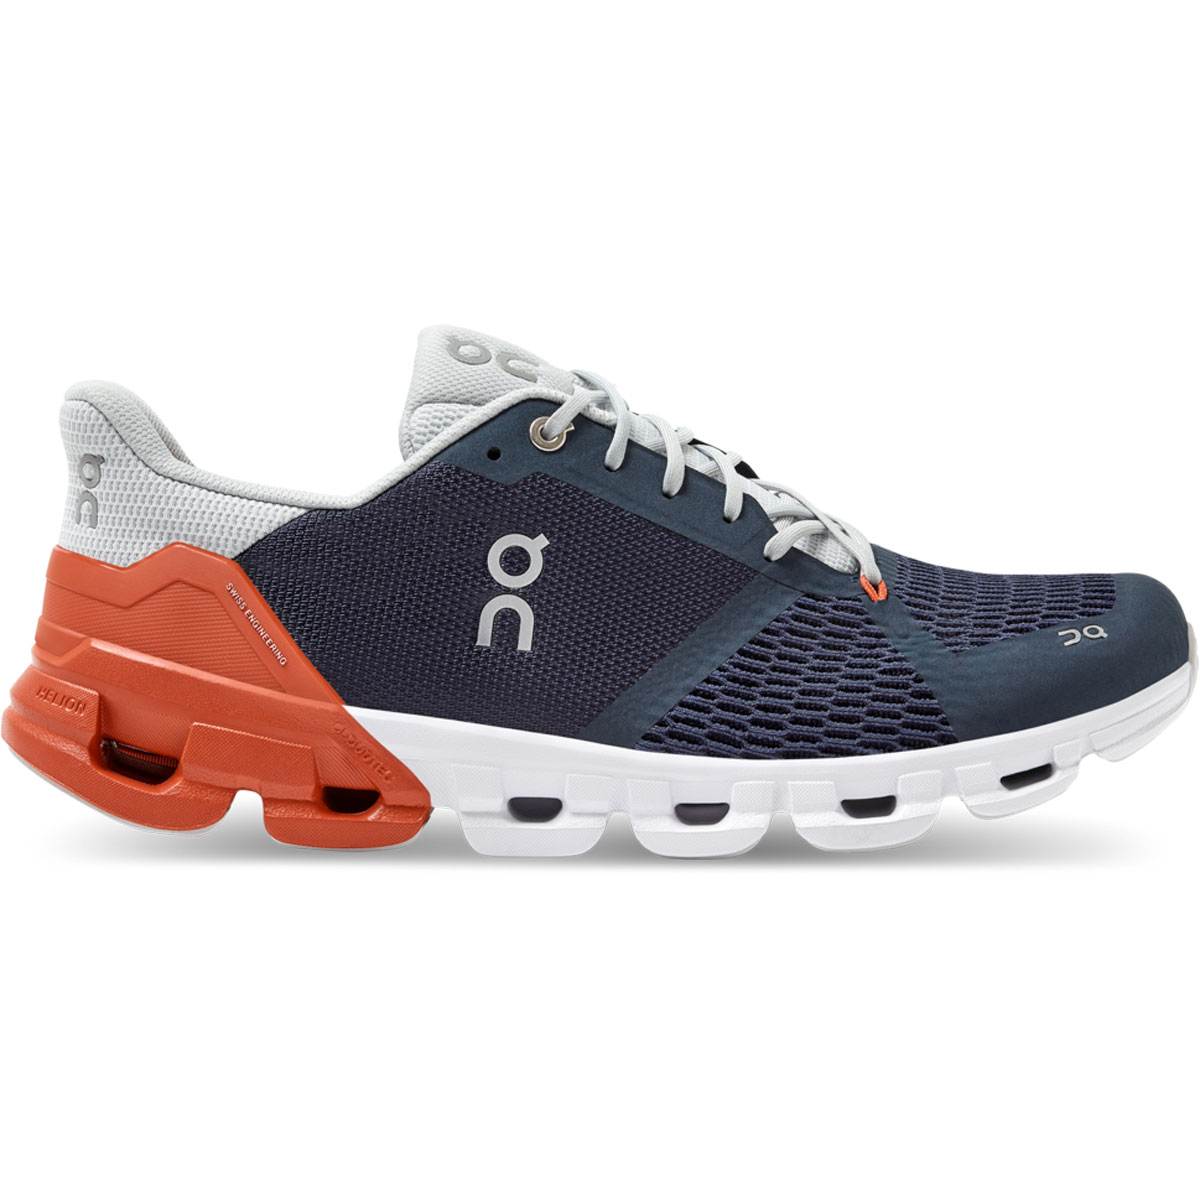 Men's On Cloudflyer 2.0 Running Shoe - Color: Midnight/Rust - Size: 7 - Width: Regular, Midnight/Rust, large, image 1